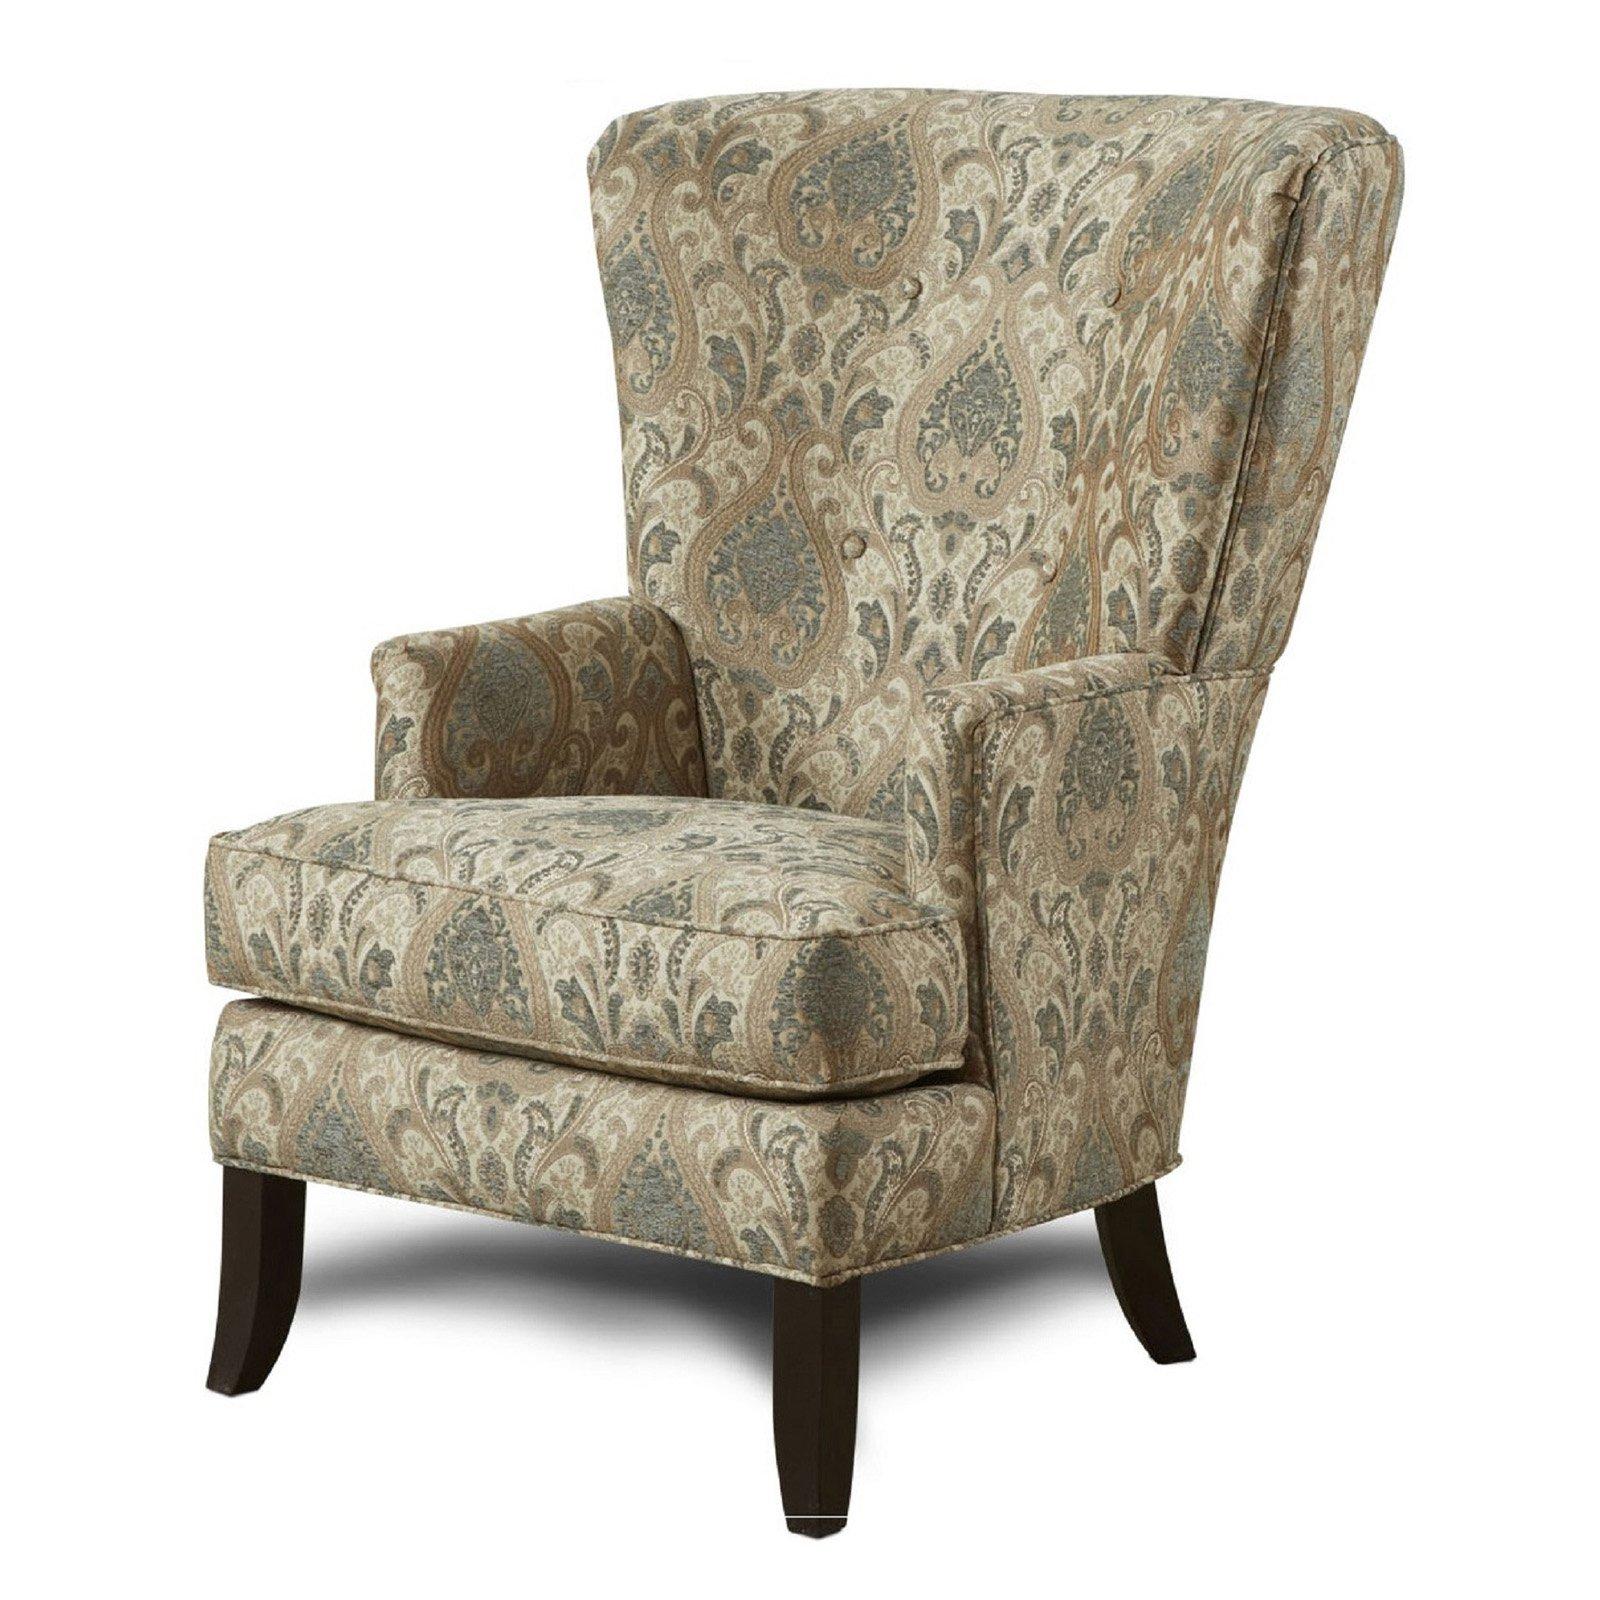 Chelsea Home Furniture Devon Martha Floral Wingback Chair